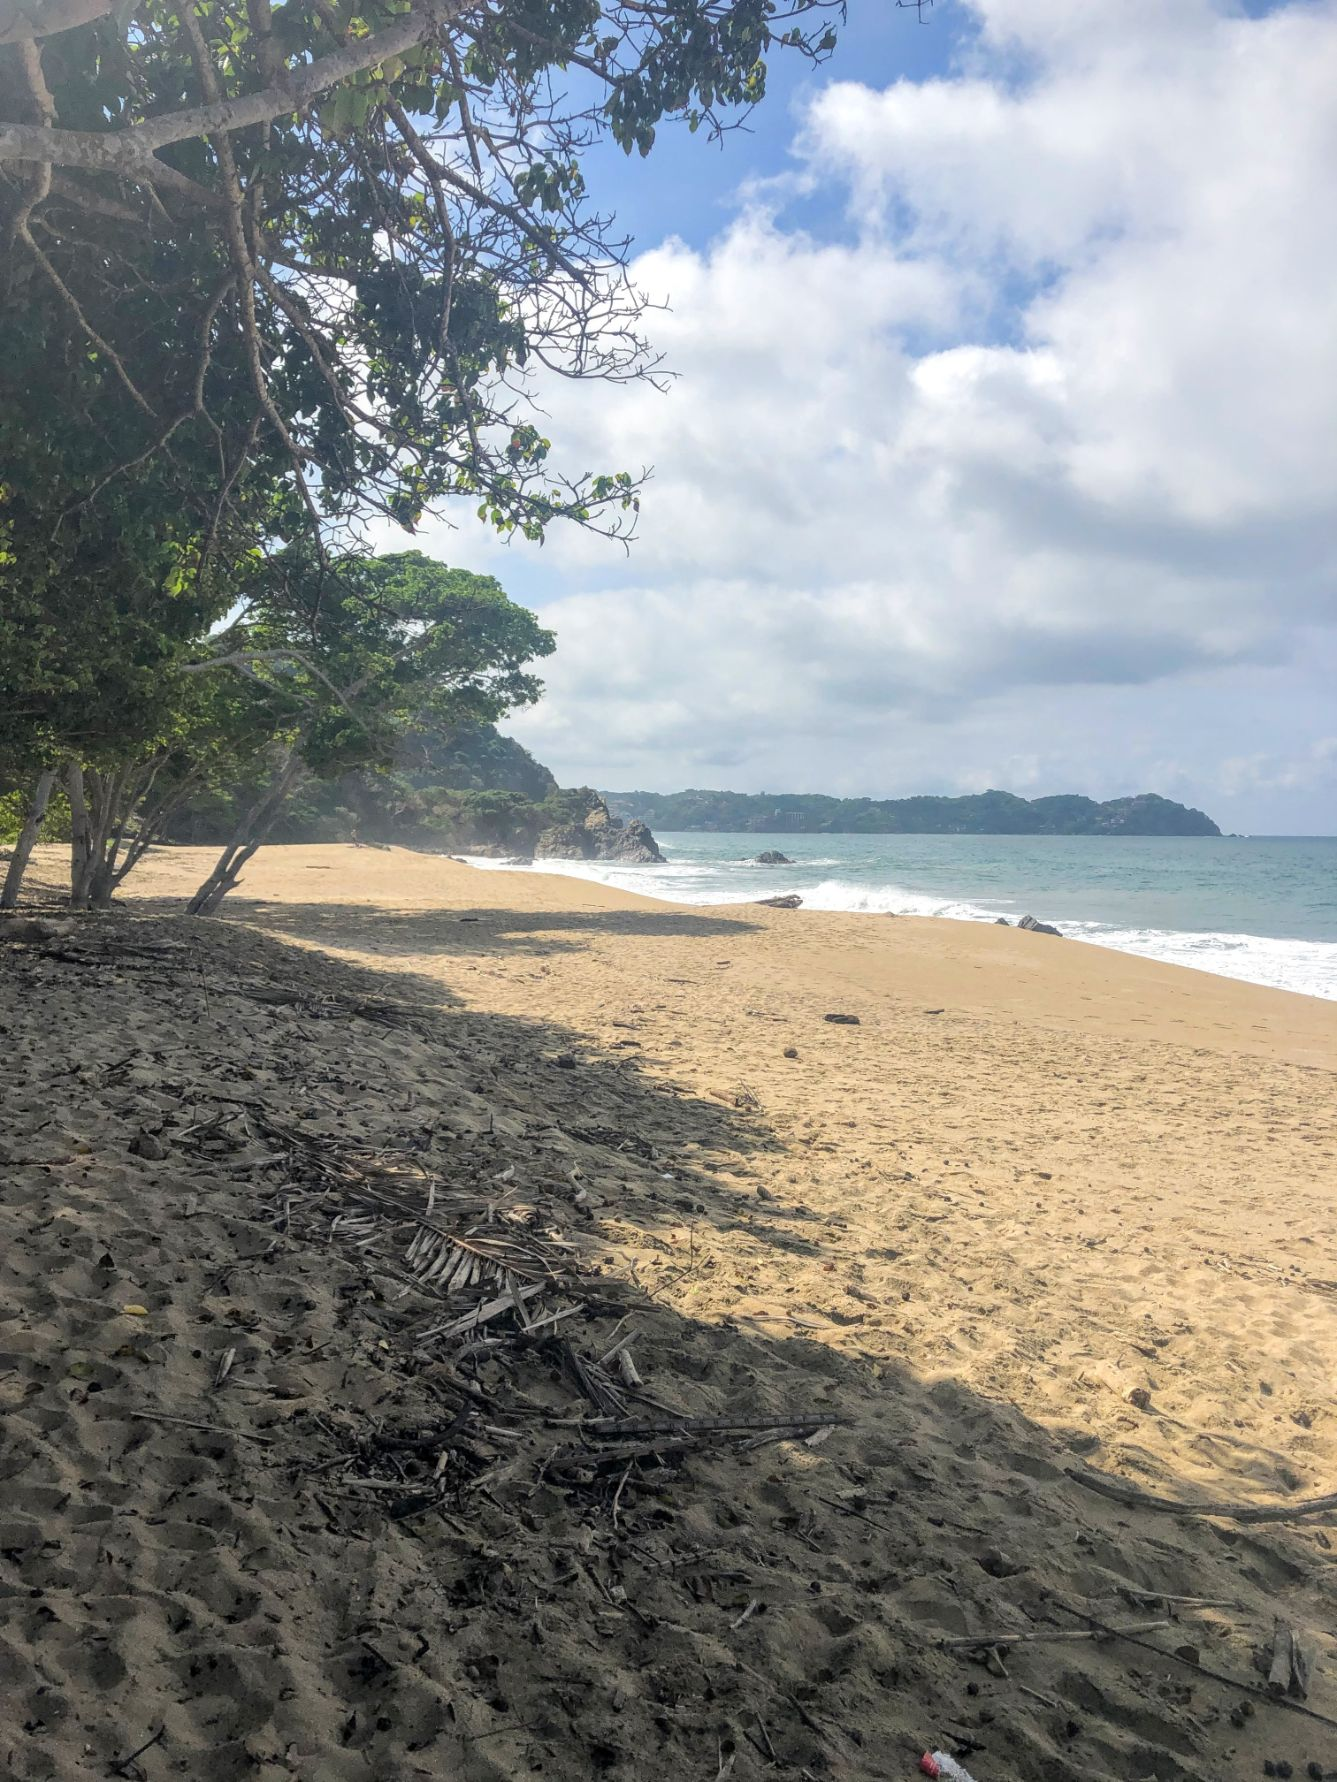 empty beach at Playa Malpaso